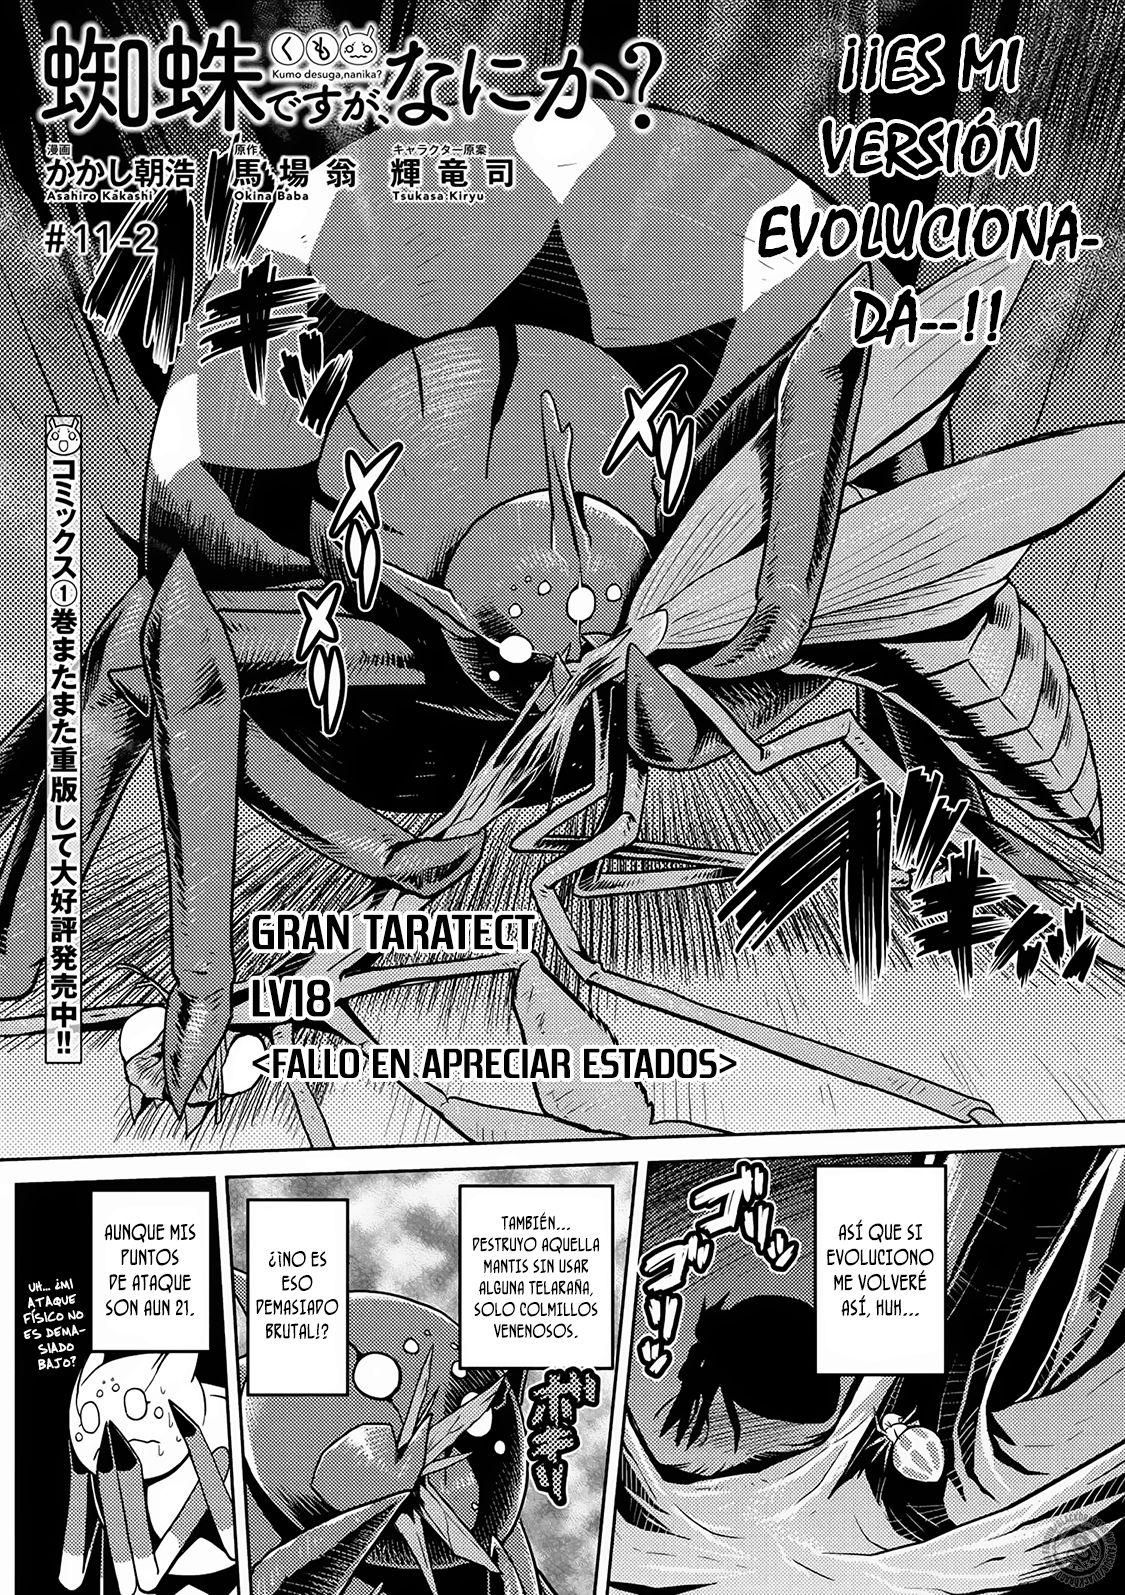 http://c5.ninemanga.com/es_manga/pic2/59/18683/508594/3d03544dfcf88ad8dcbdc8d88a2aeb85.jpg Page 2